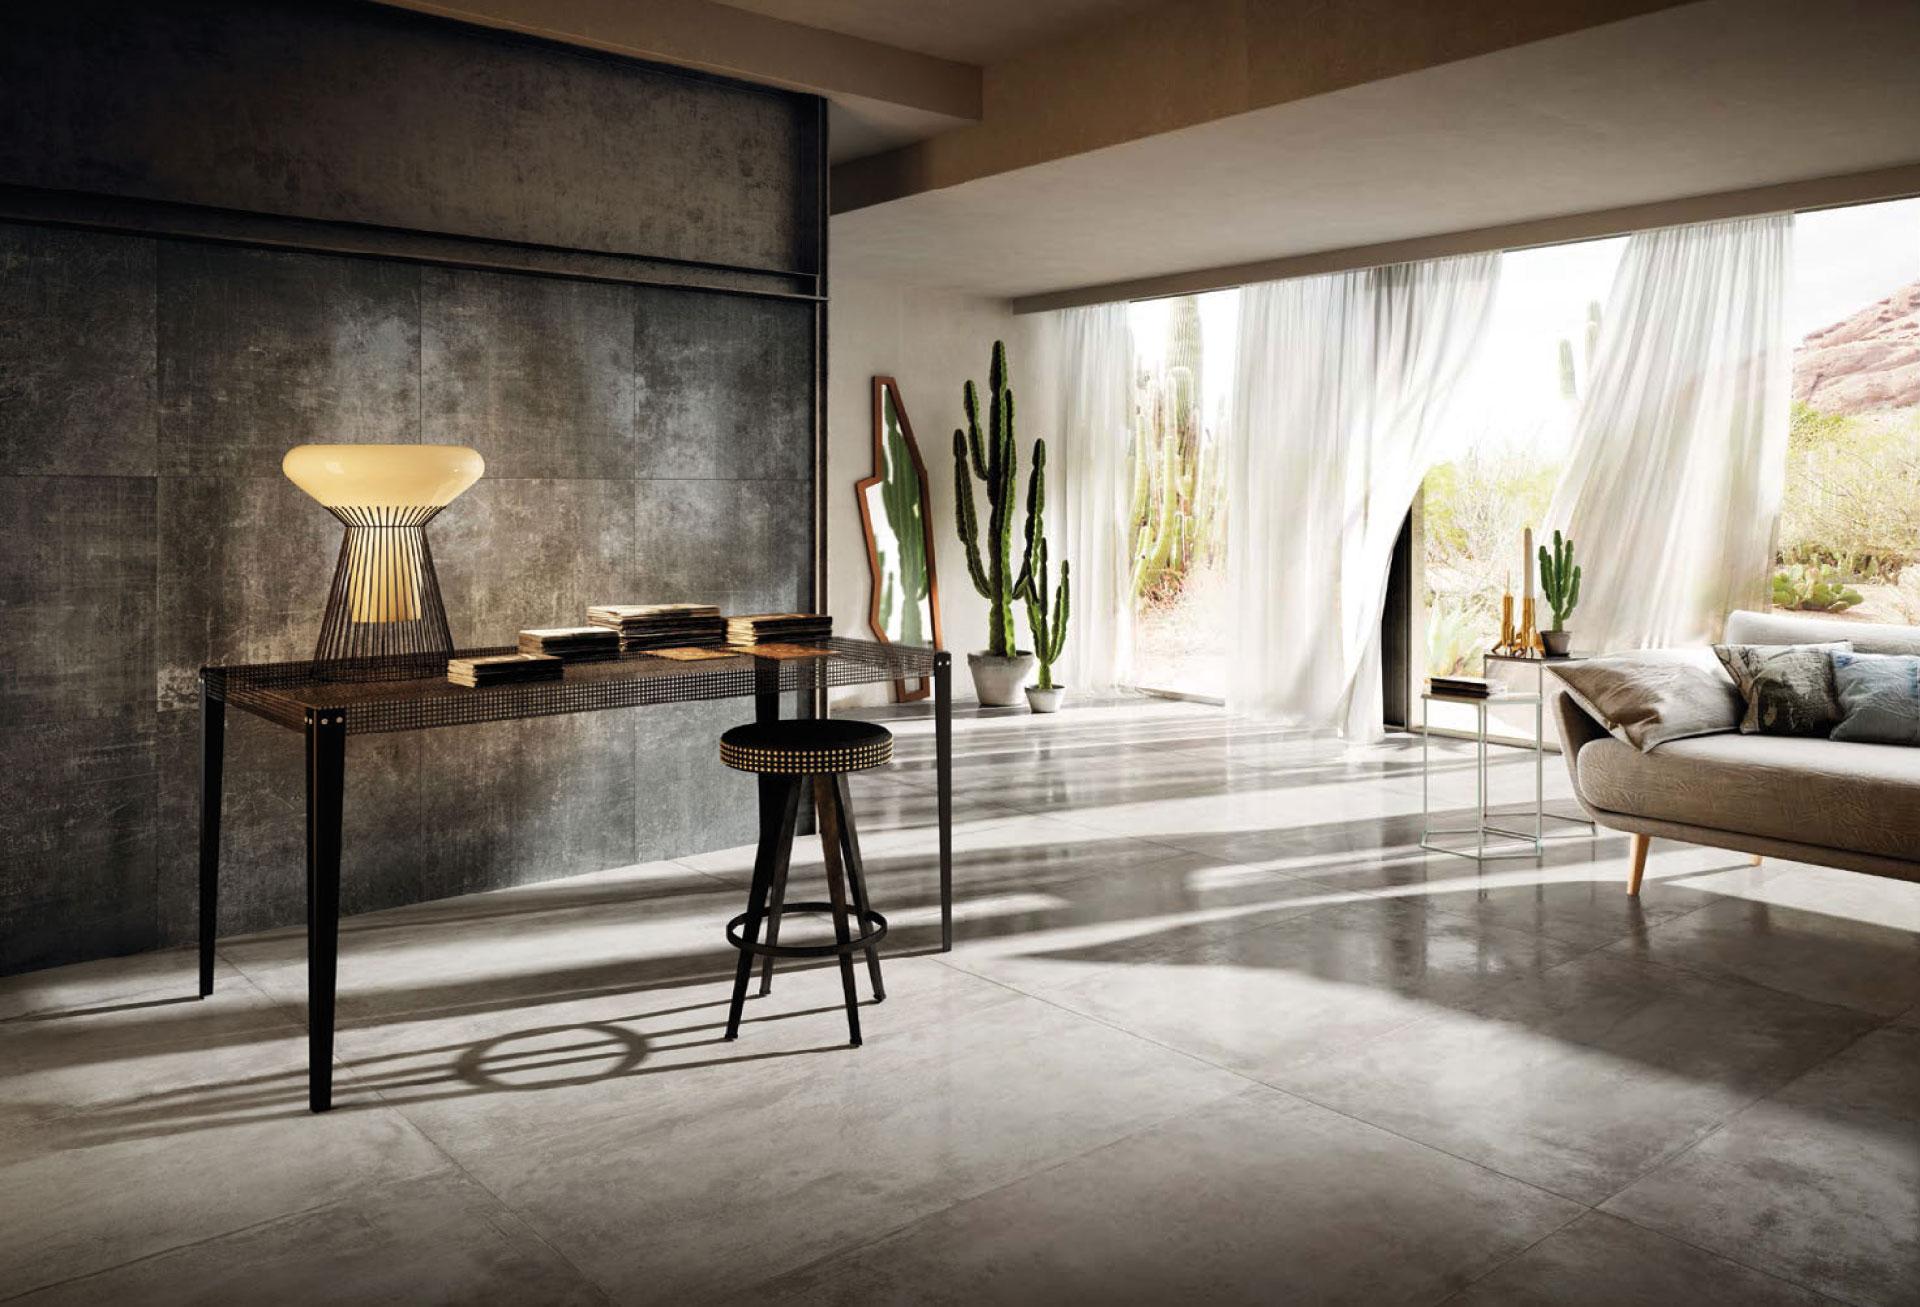 Neue zeitgenoessische Verkleidungen Diesel Living with Iris Ceramica ...